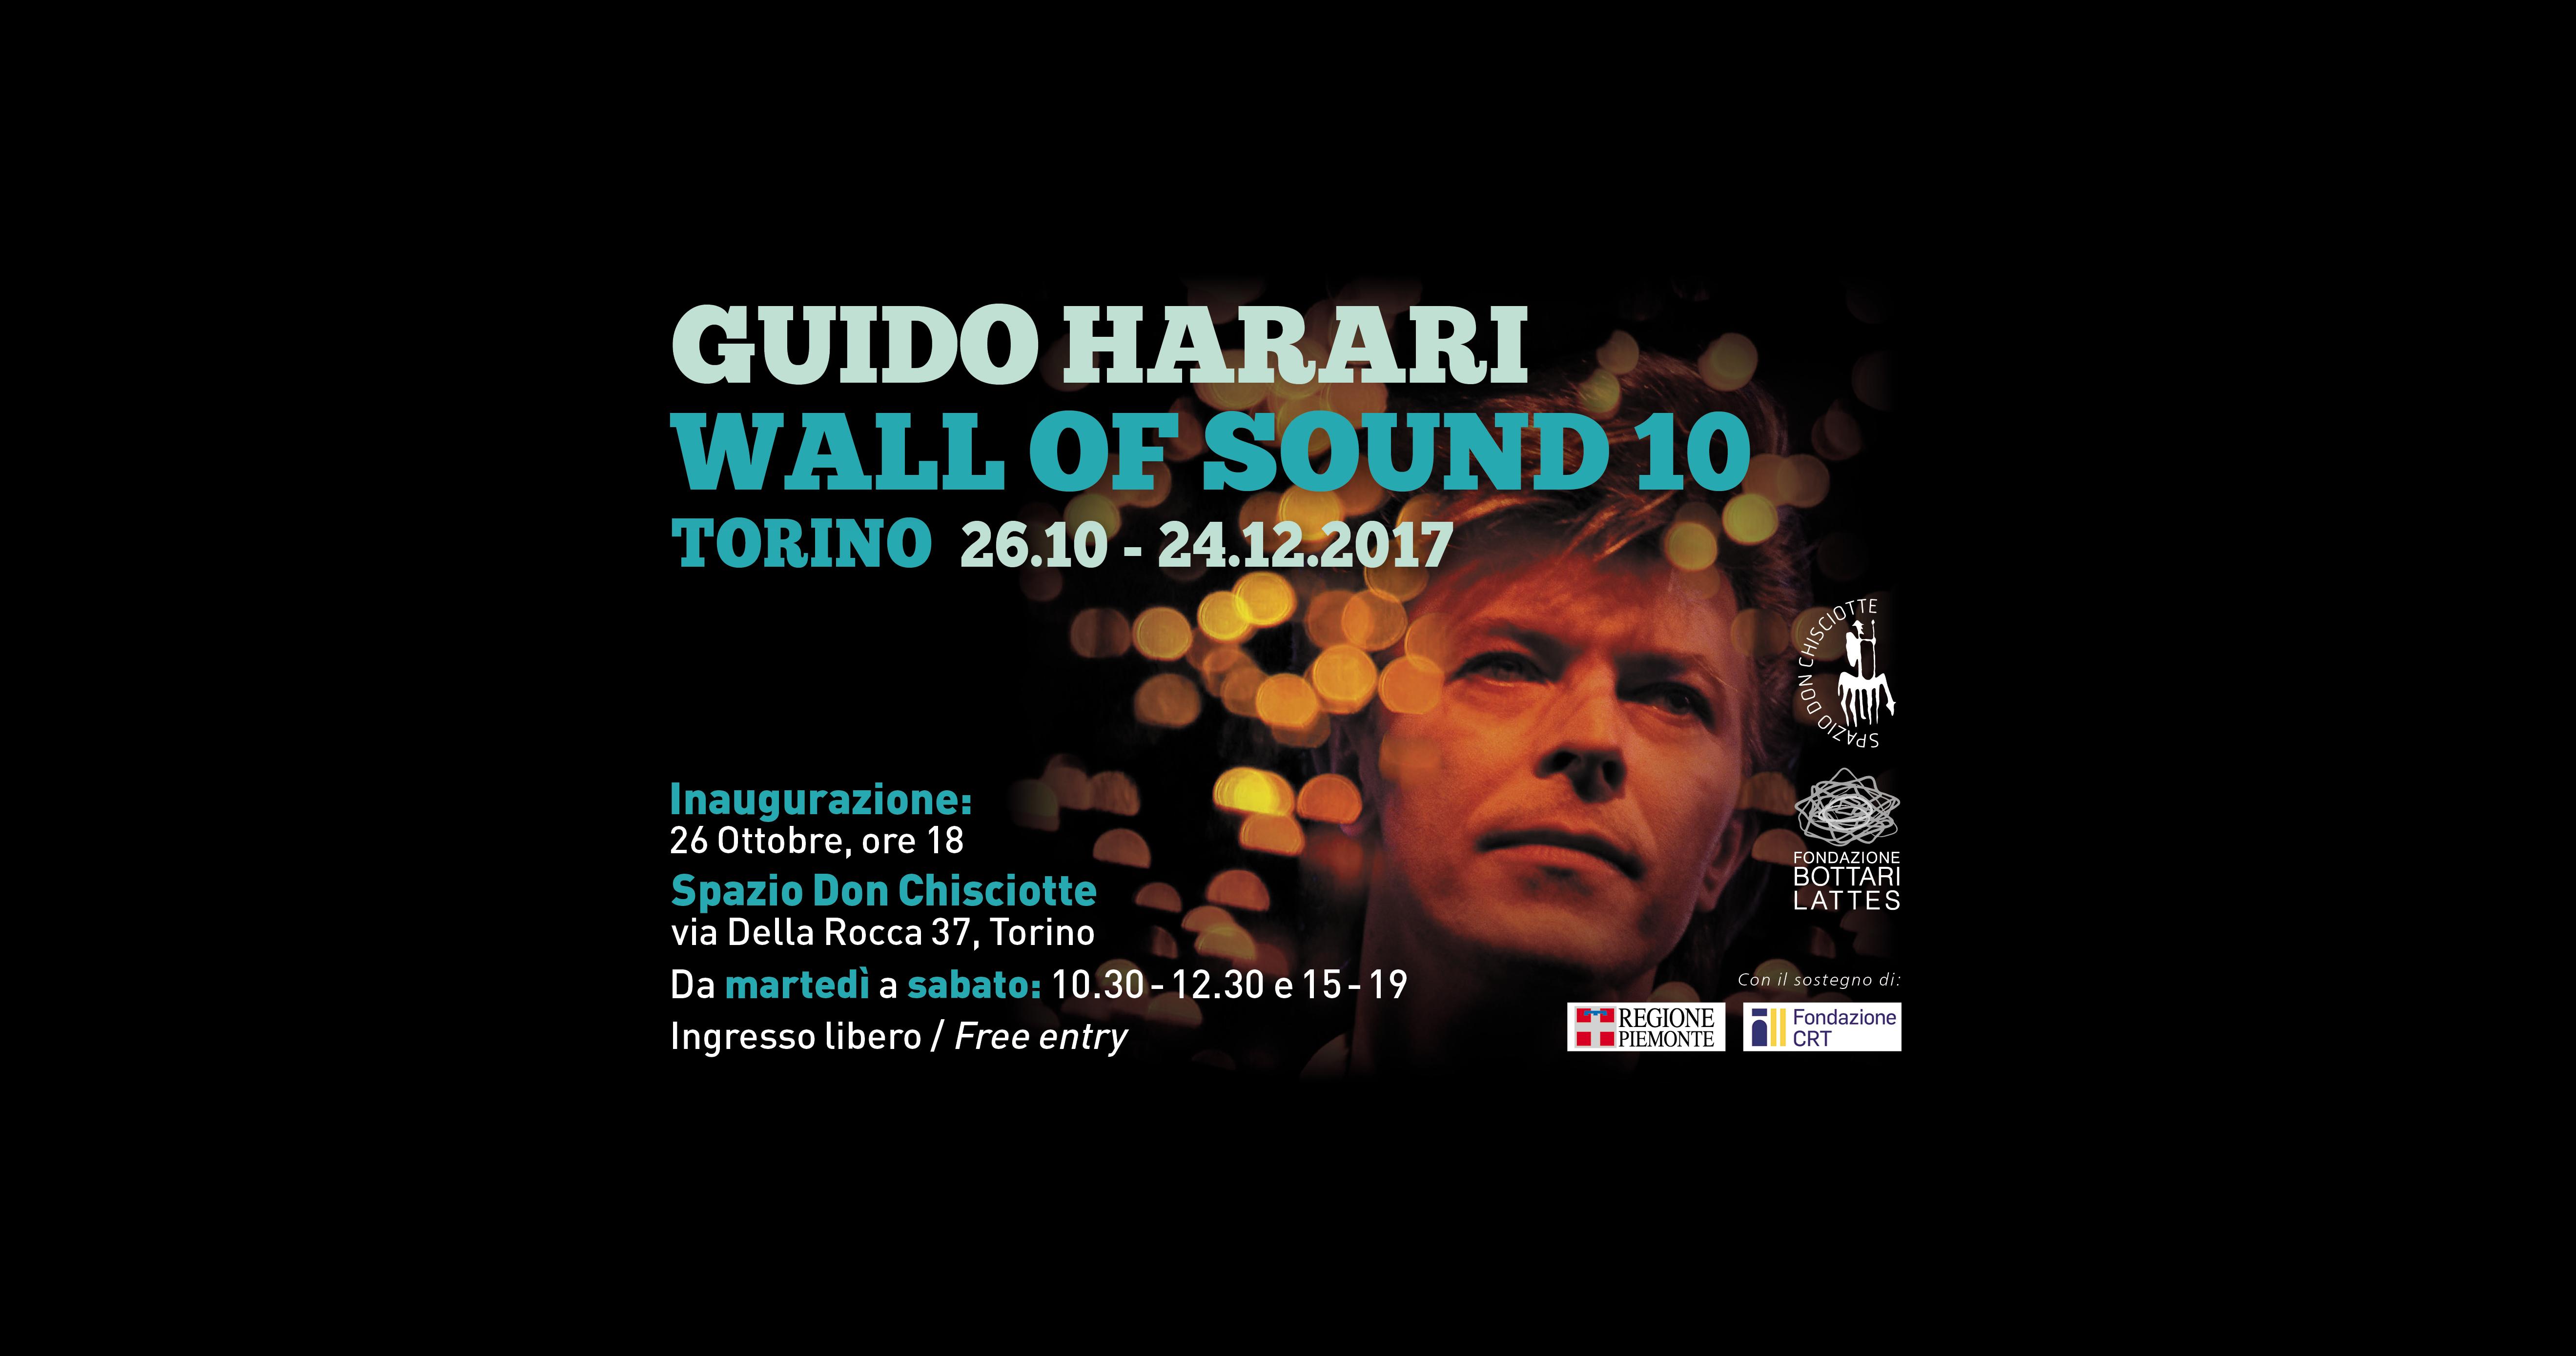 Guido Harari  Wall of Sound 10 a Torino